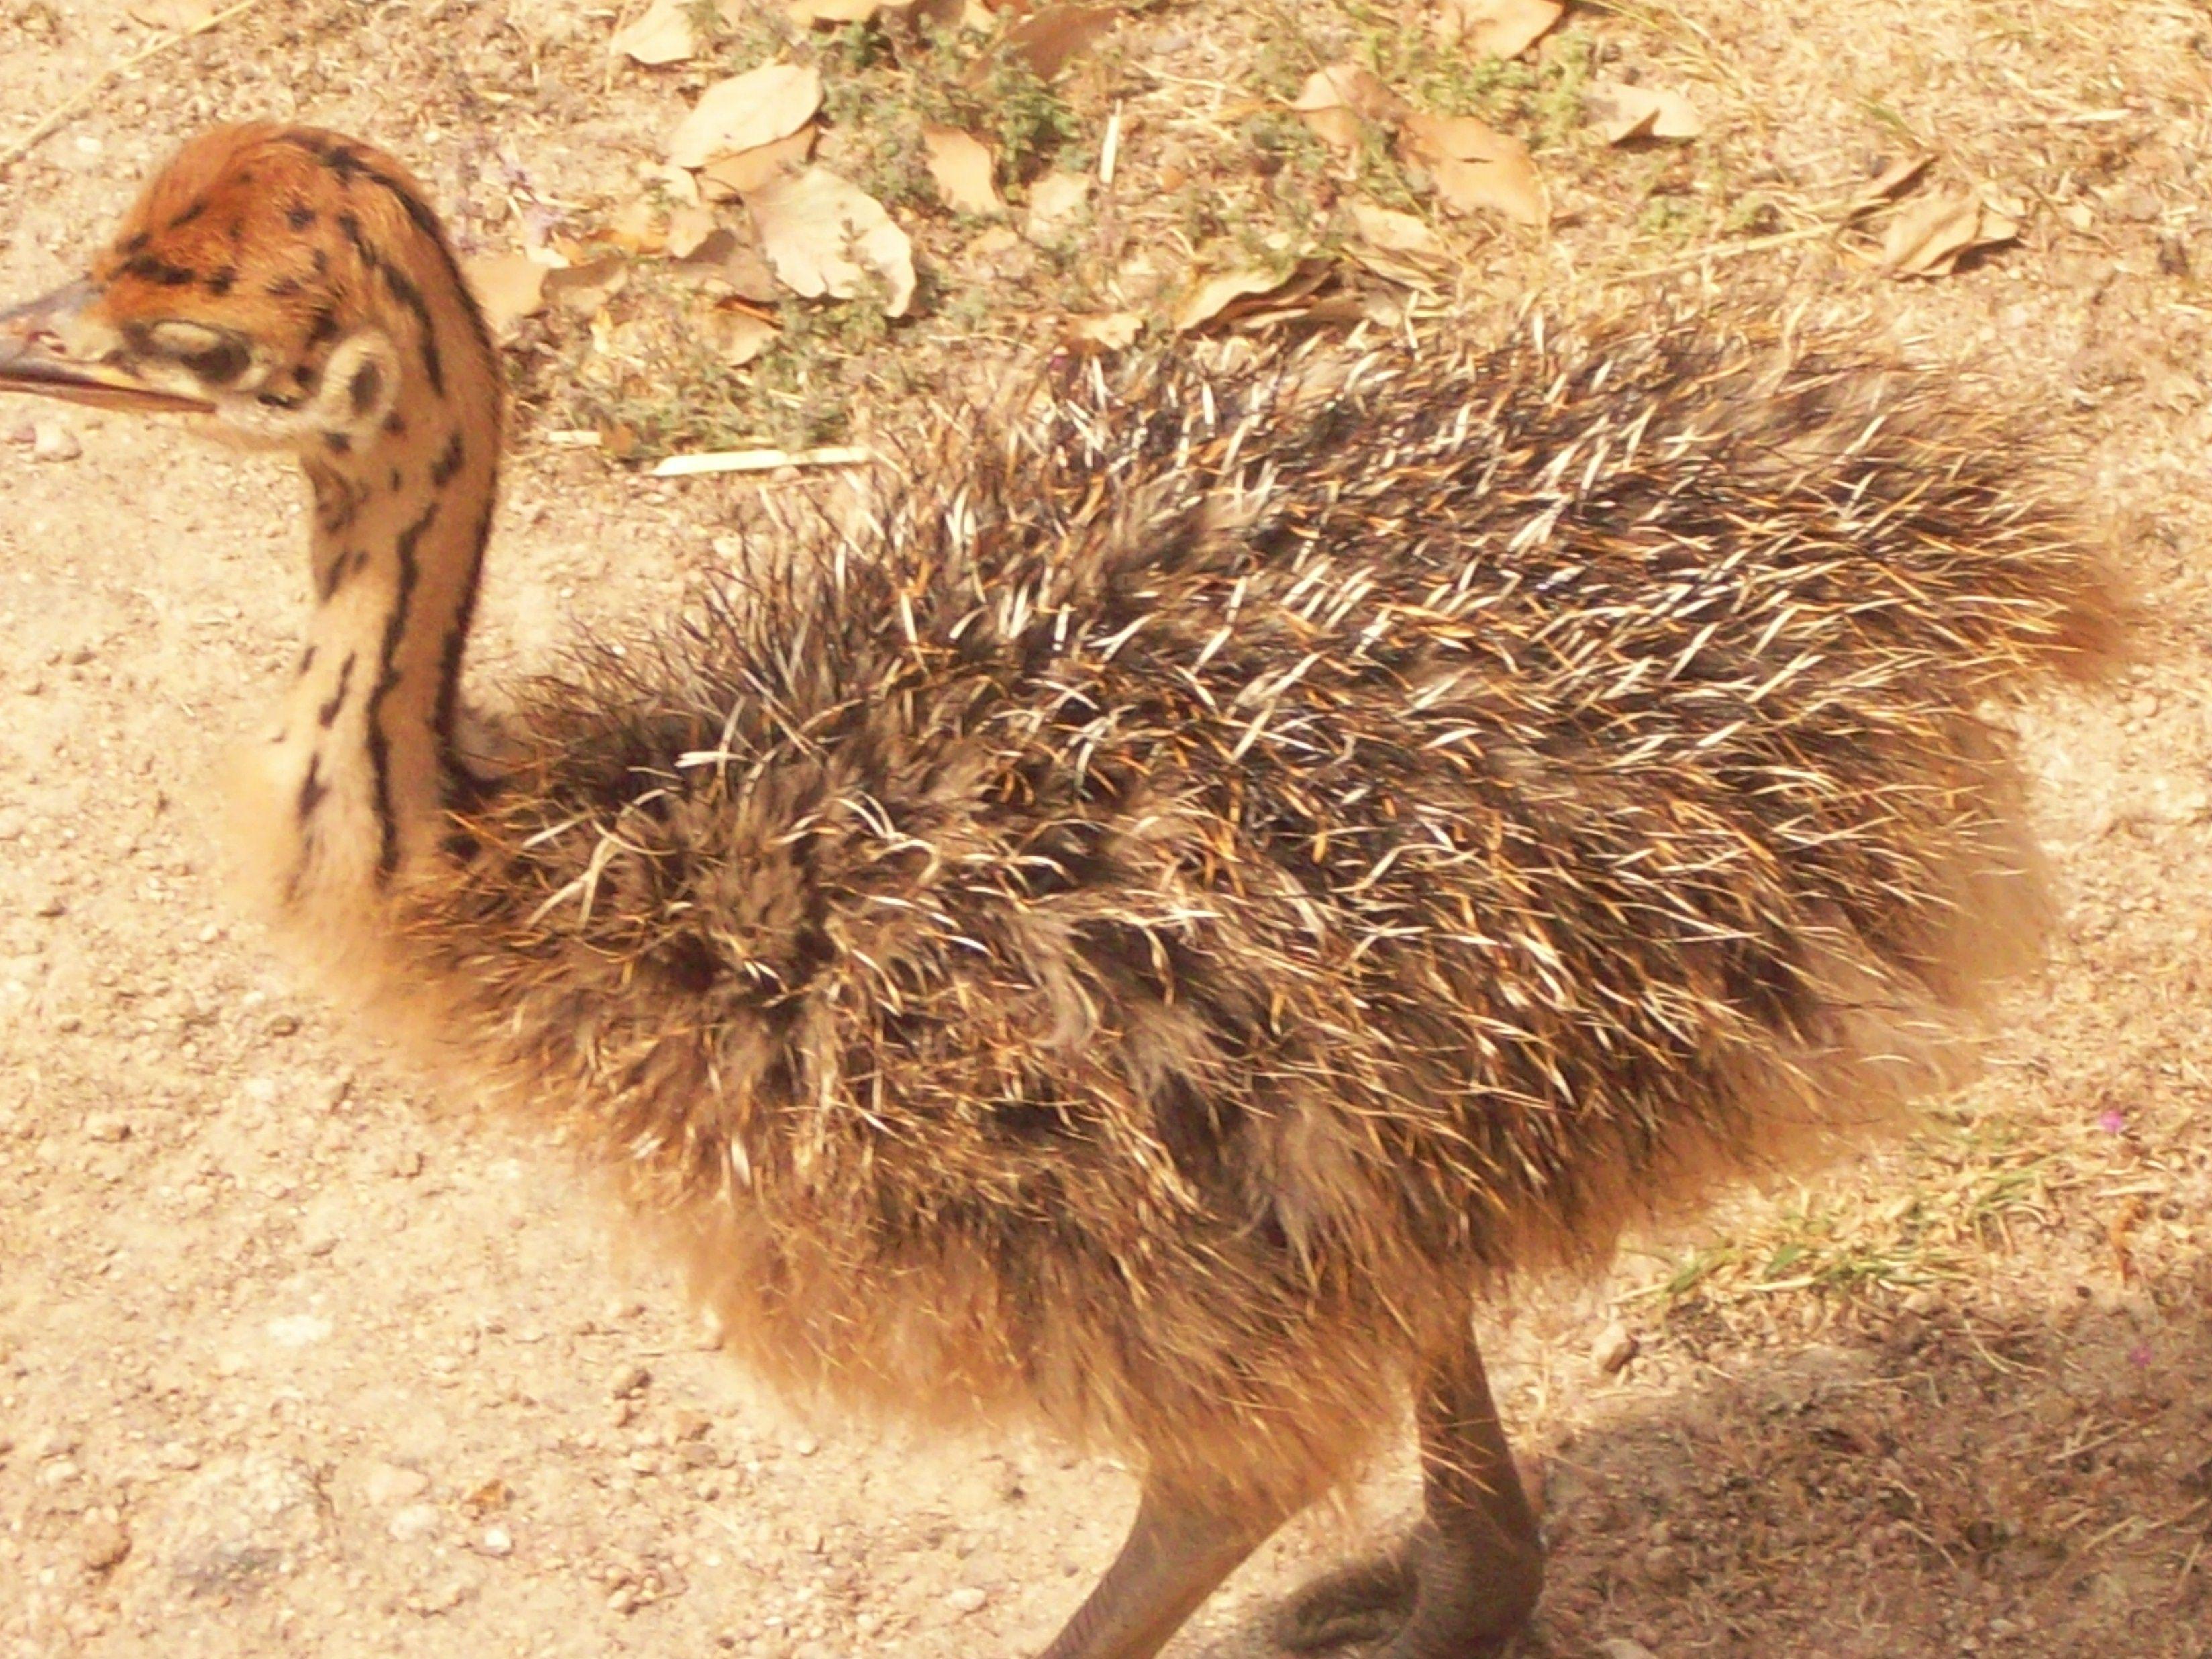 Monte selvagem avestruz bebe Monte Selvagem baby ostrich